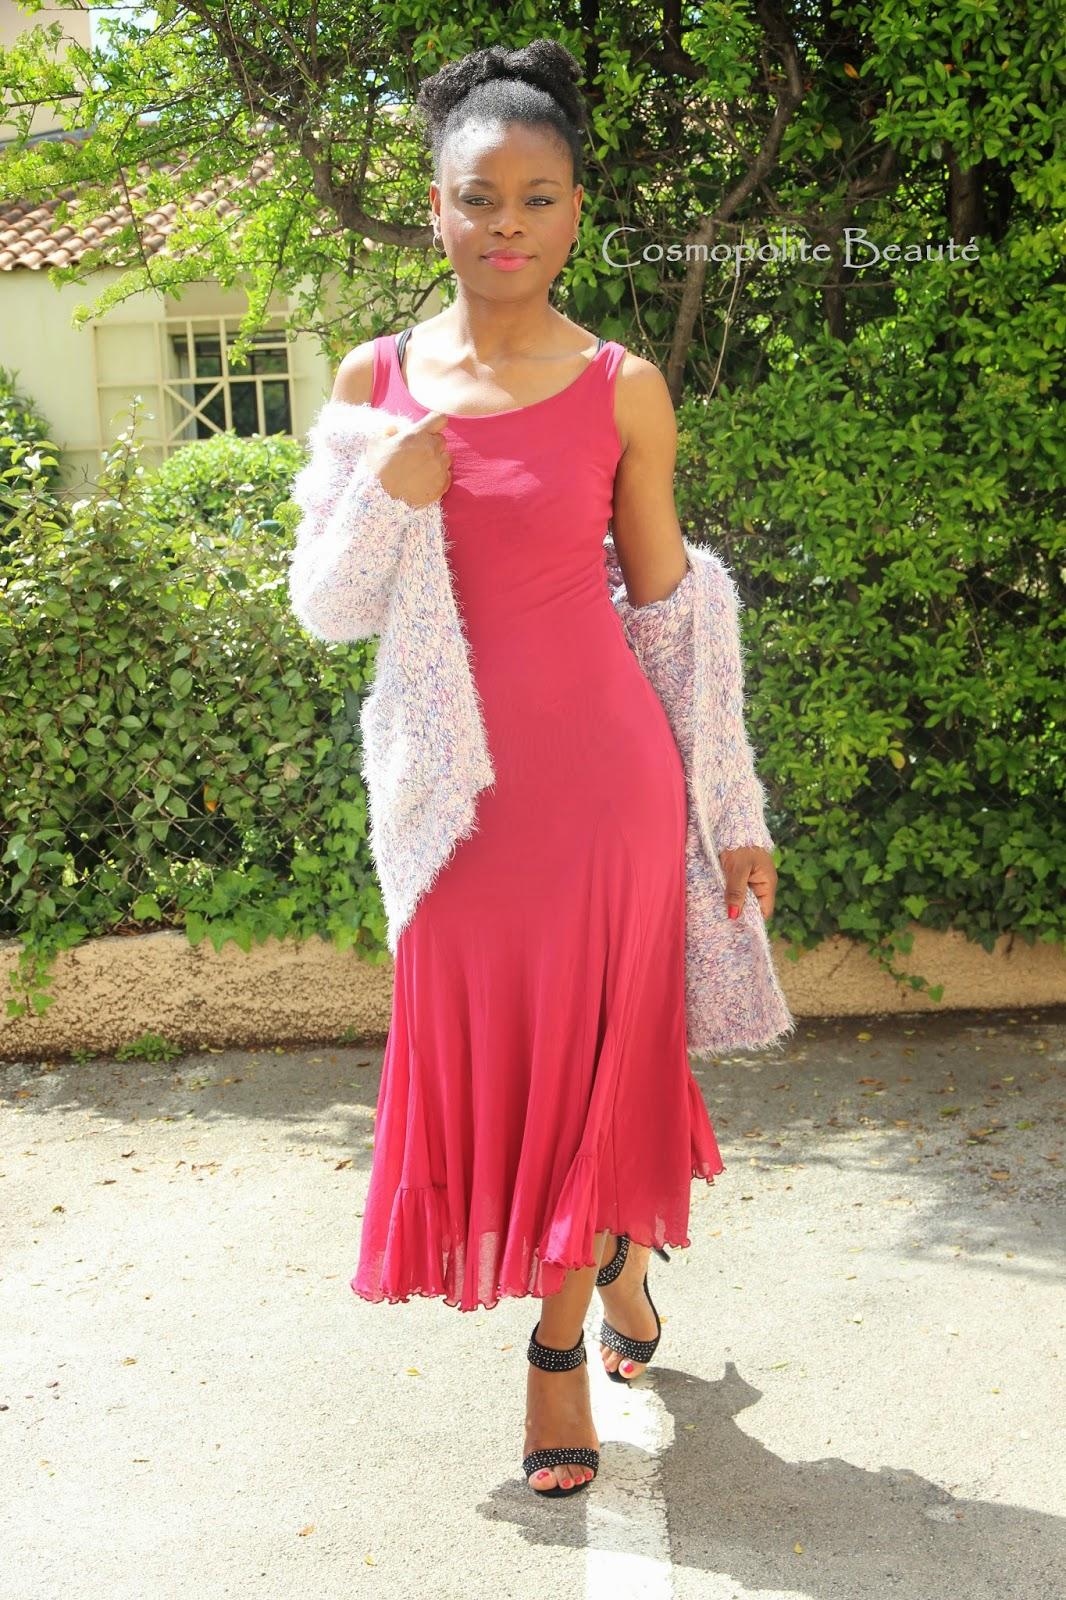 byn french challenge, lookbook, cosmopolite beauté, cosmopolitan beauty, tenue, pastel, look, maxi gilet, robe longue, fushia, sandales à talons